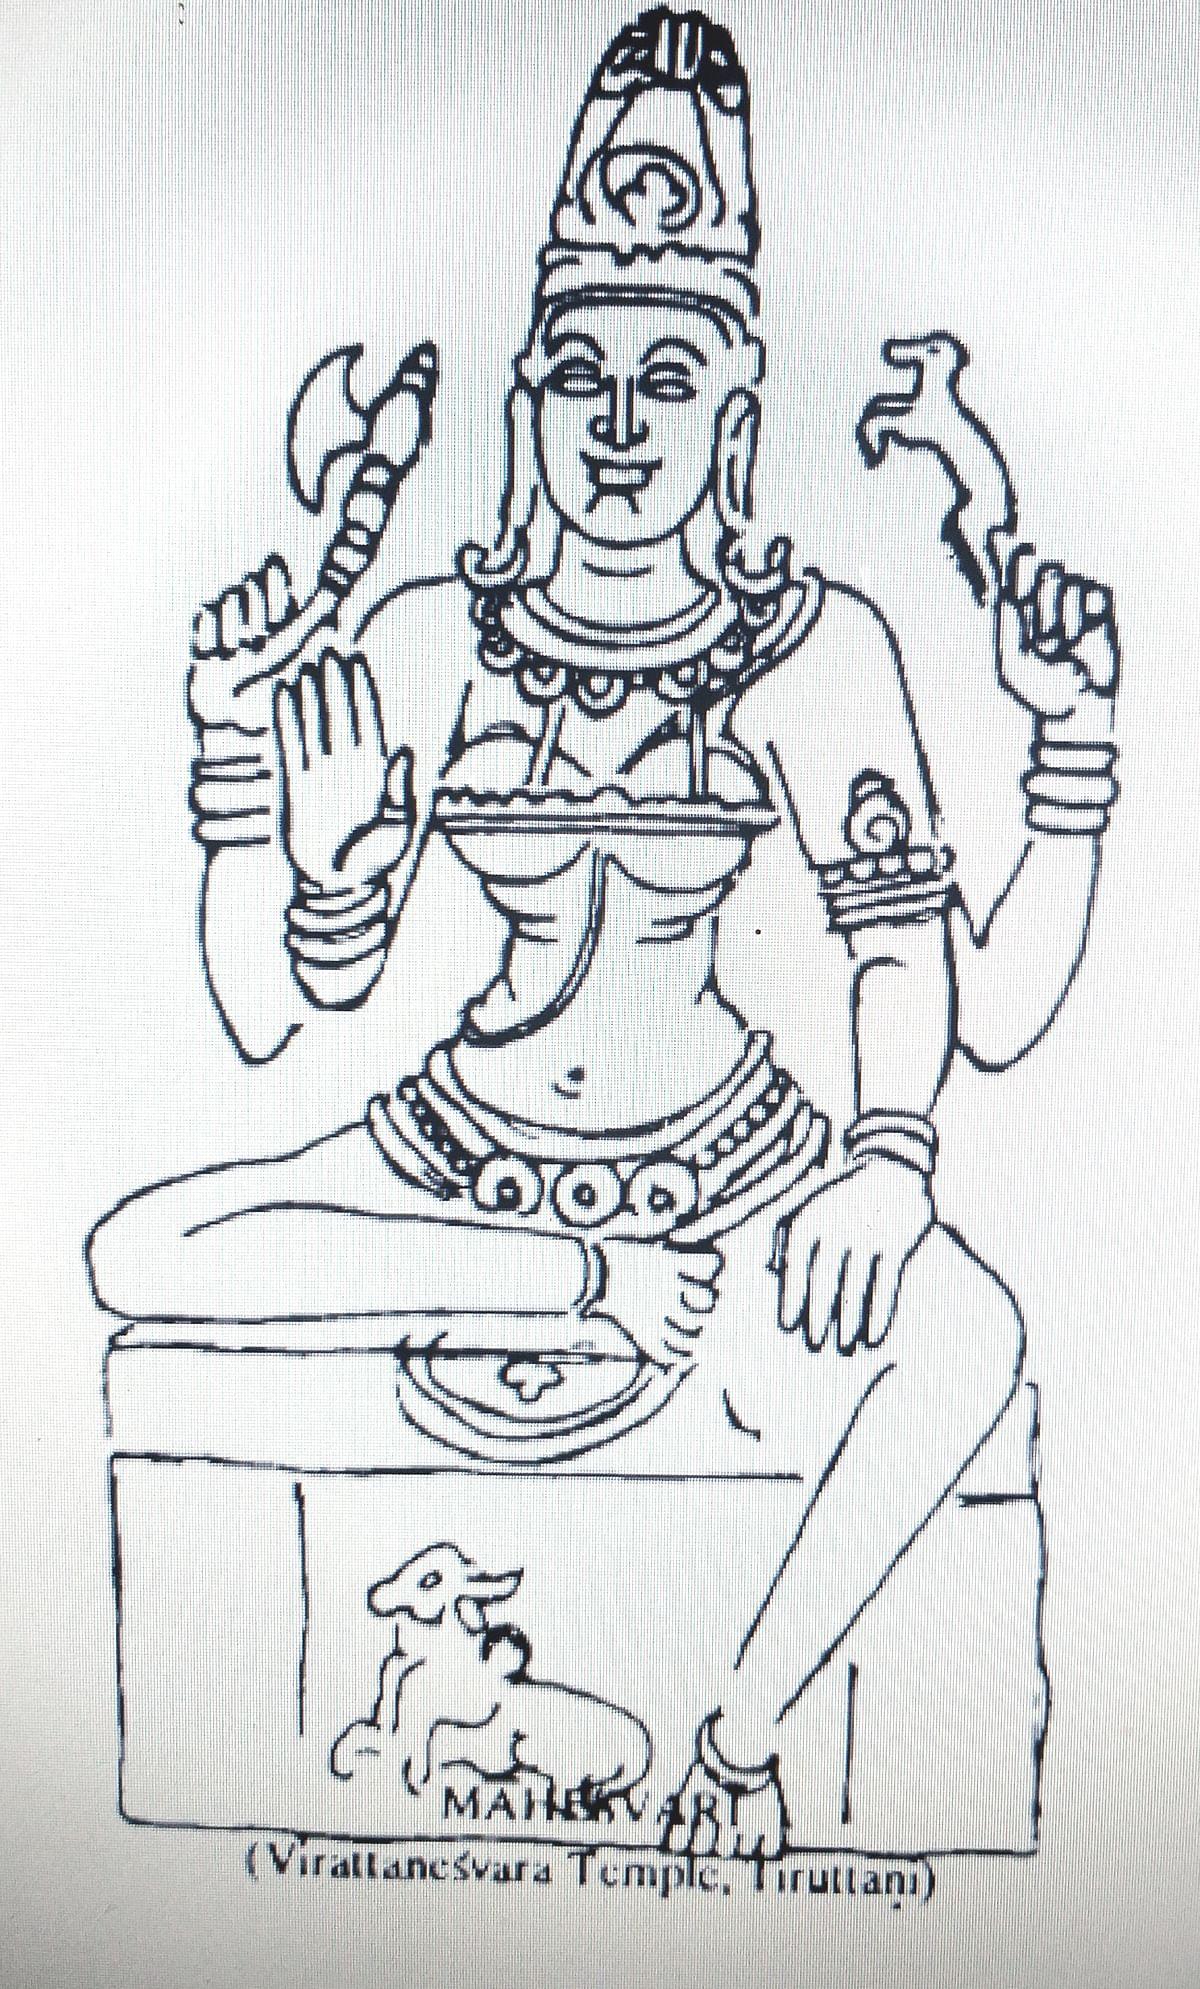 Line drawing of Goddess Maheshwari from 'Pratima Kosh'.